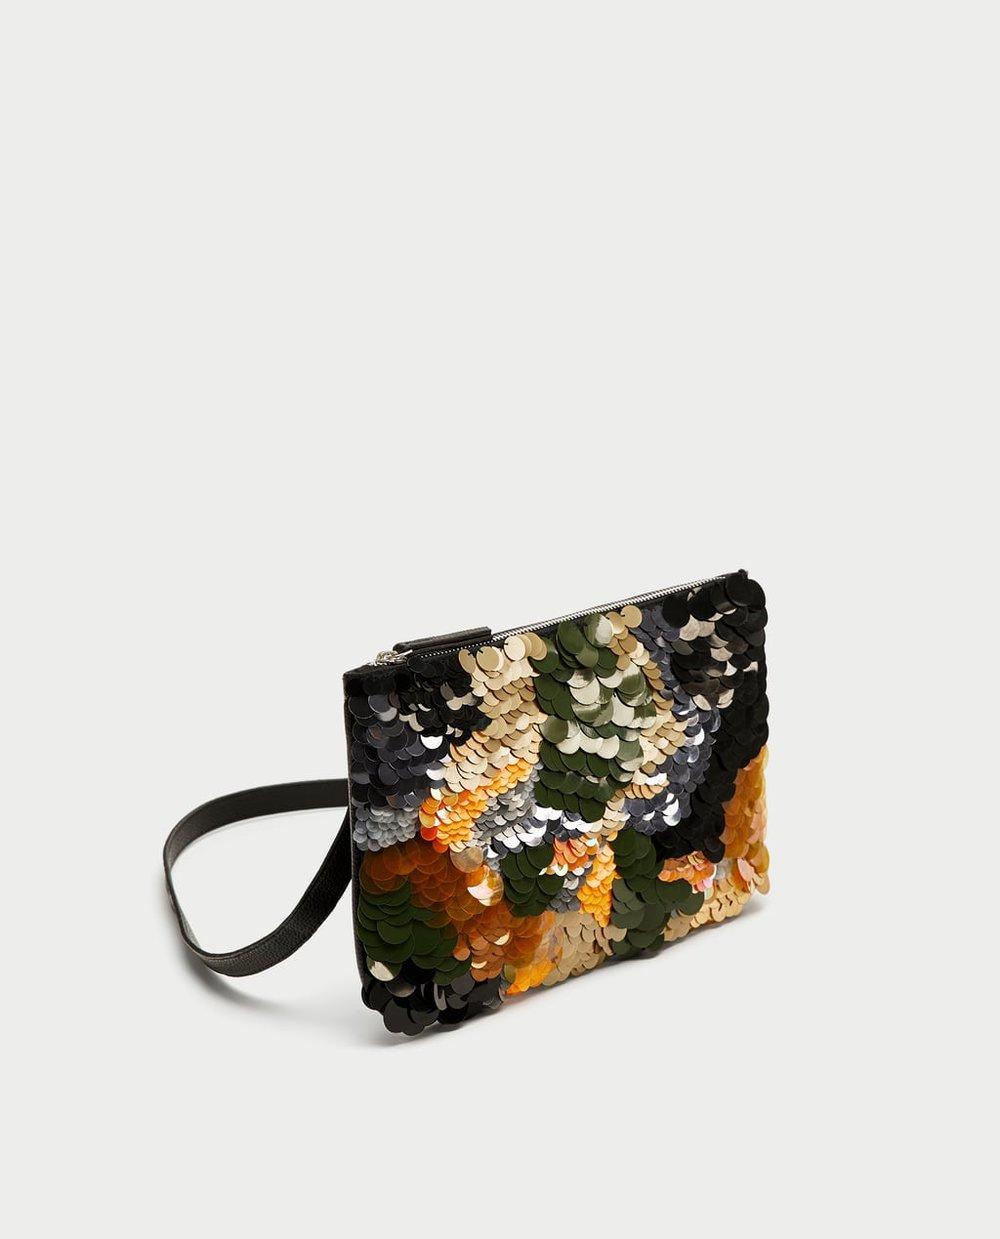 SEQUINNED BELT BAG CLUTCH. Zara. $39.